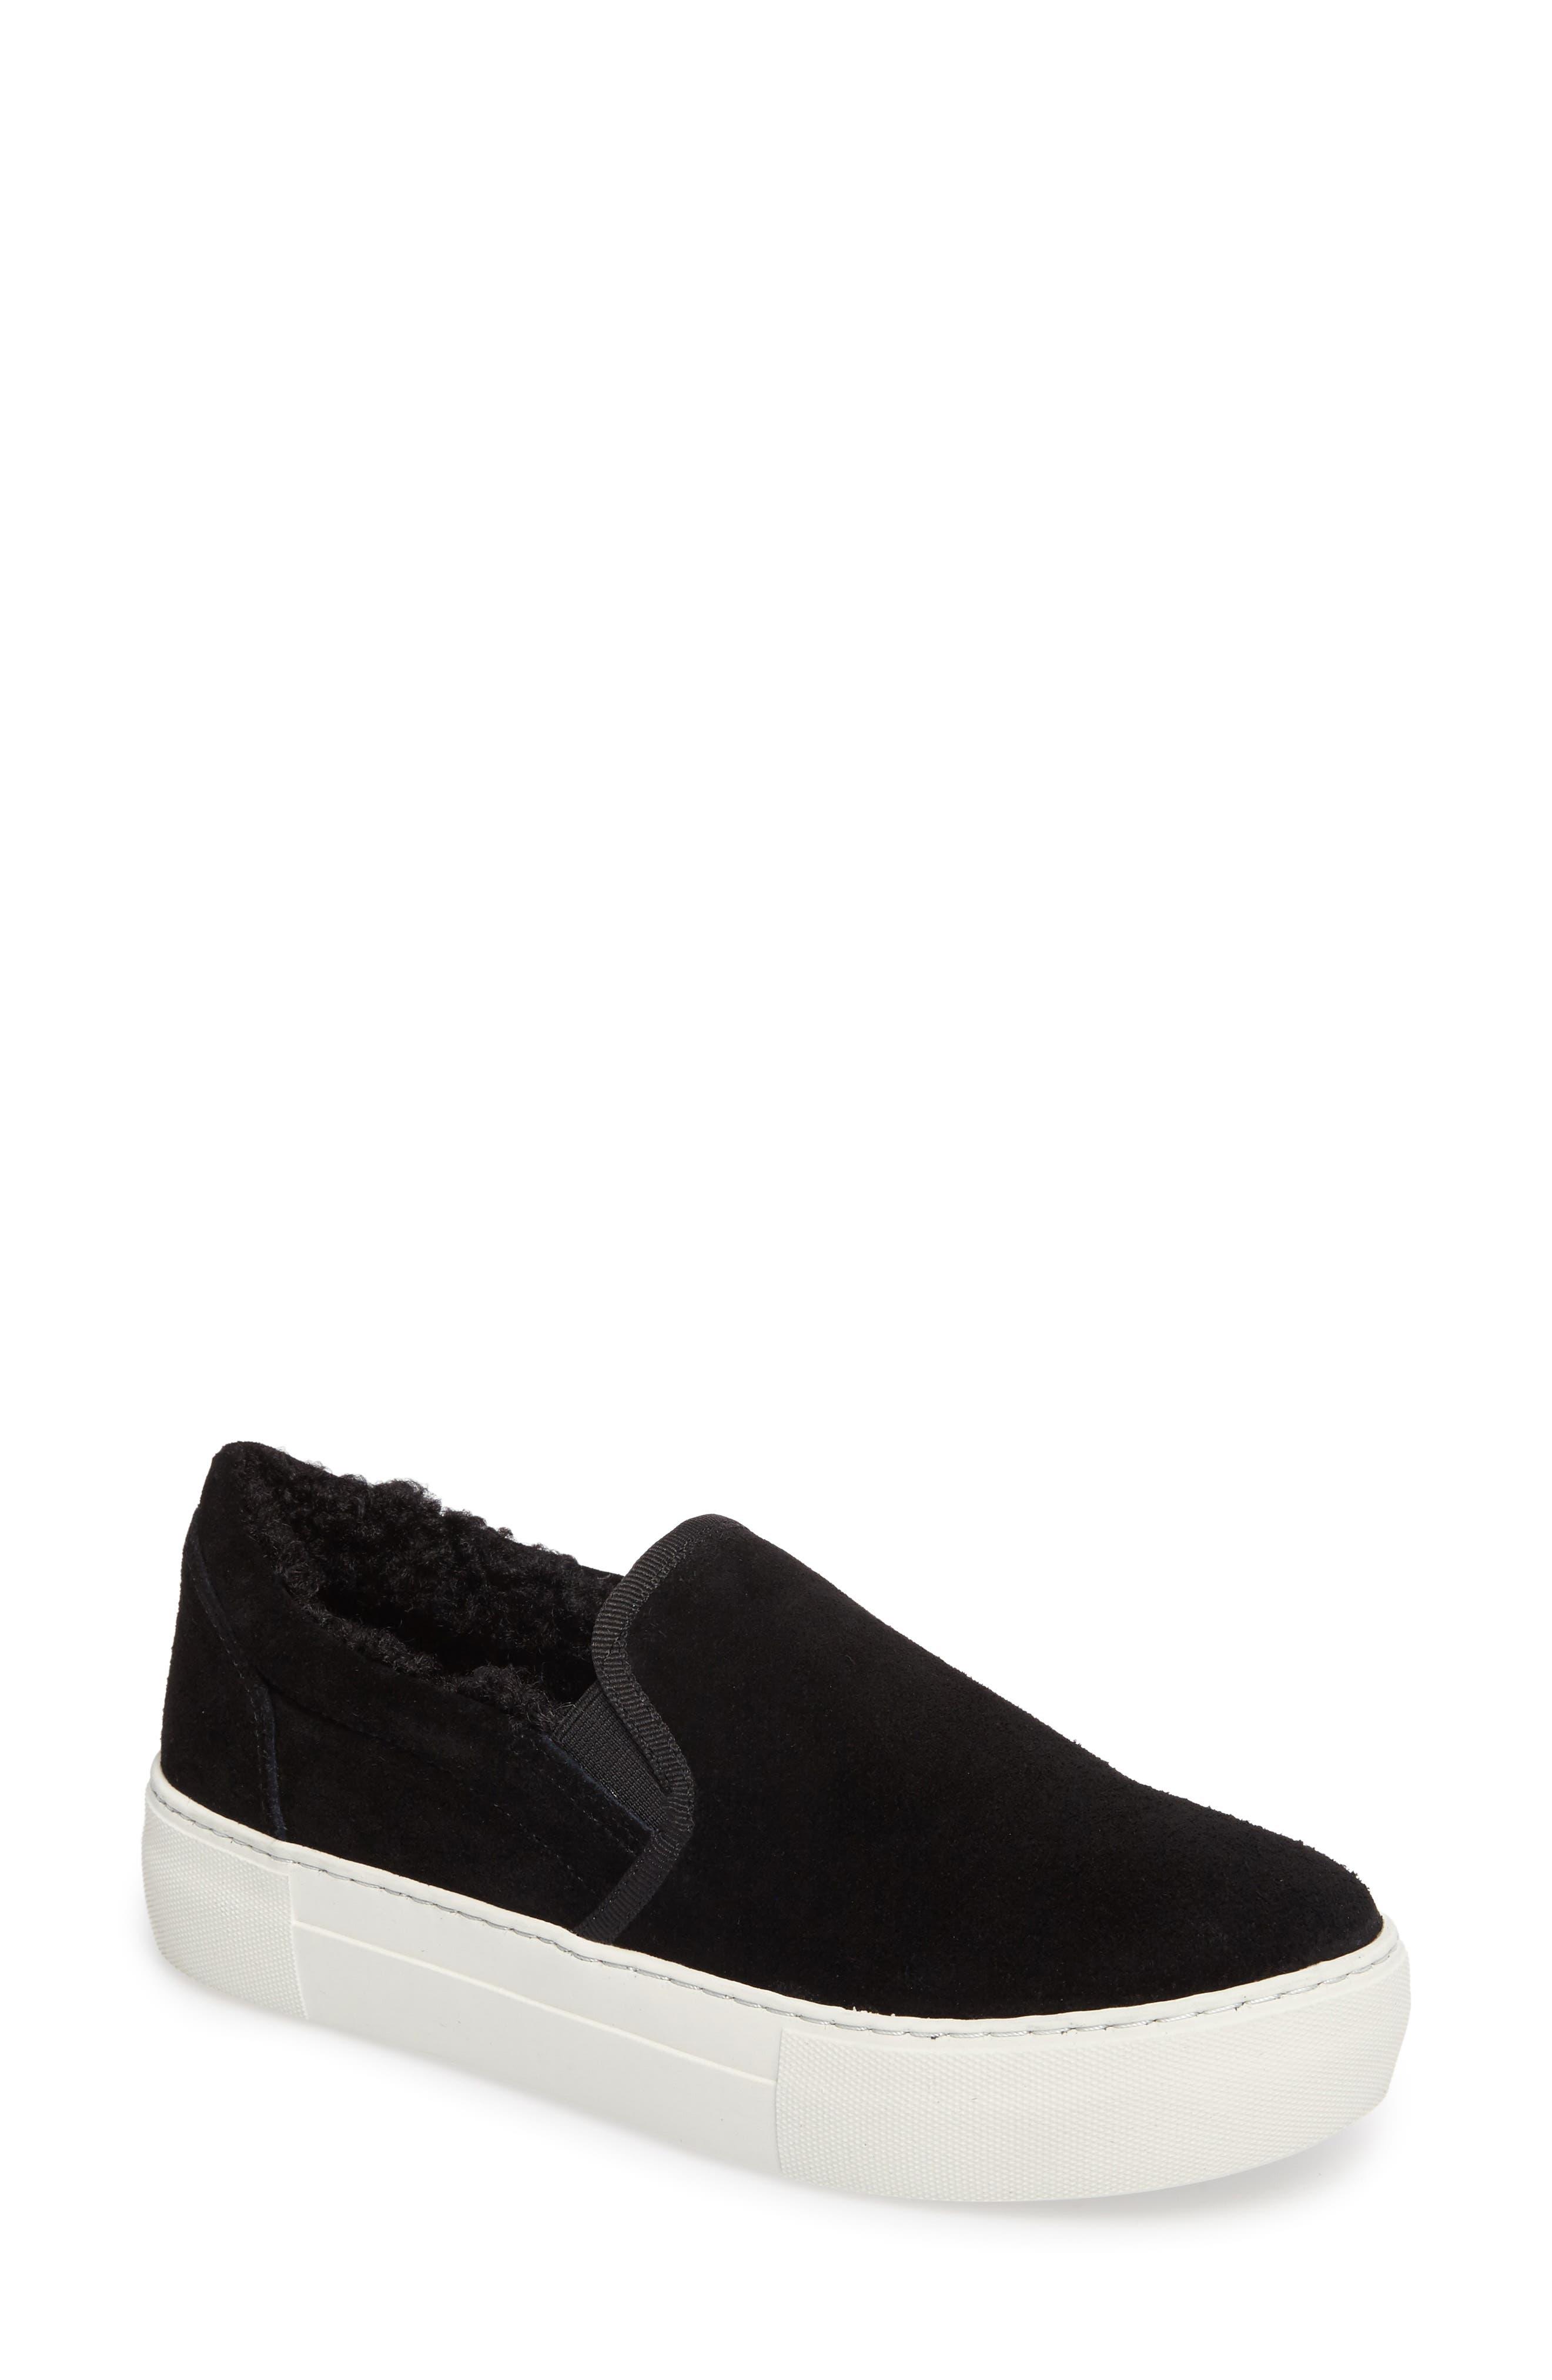 Arpel Faux Fur Lined Slip-On Sneaker,                             Main thumbnail 1, color,                             Black Suede